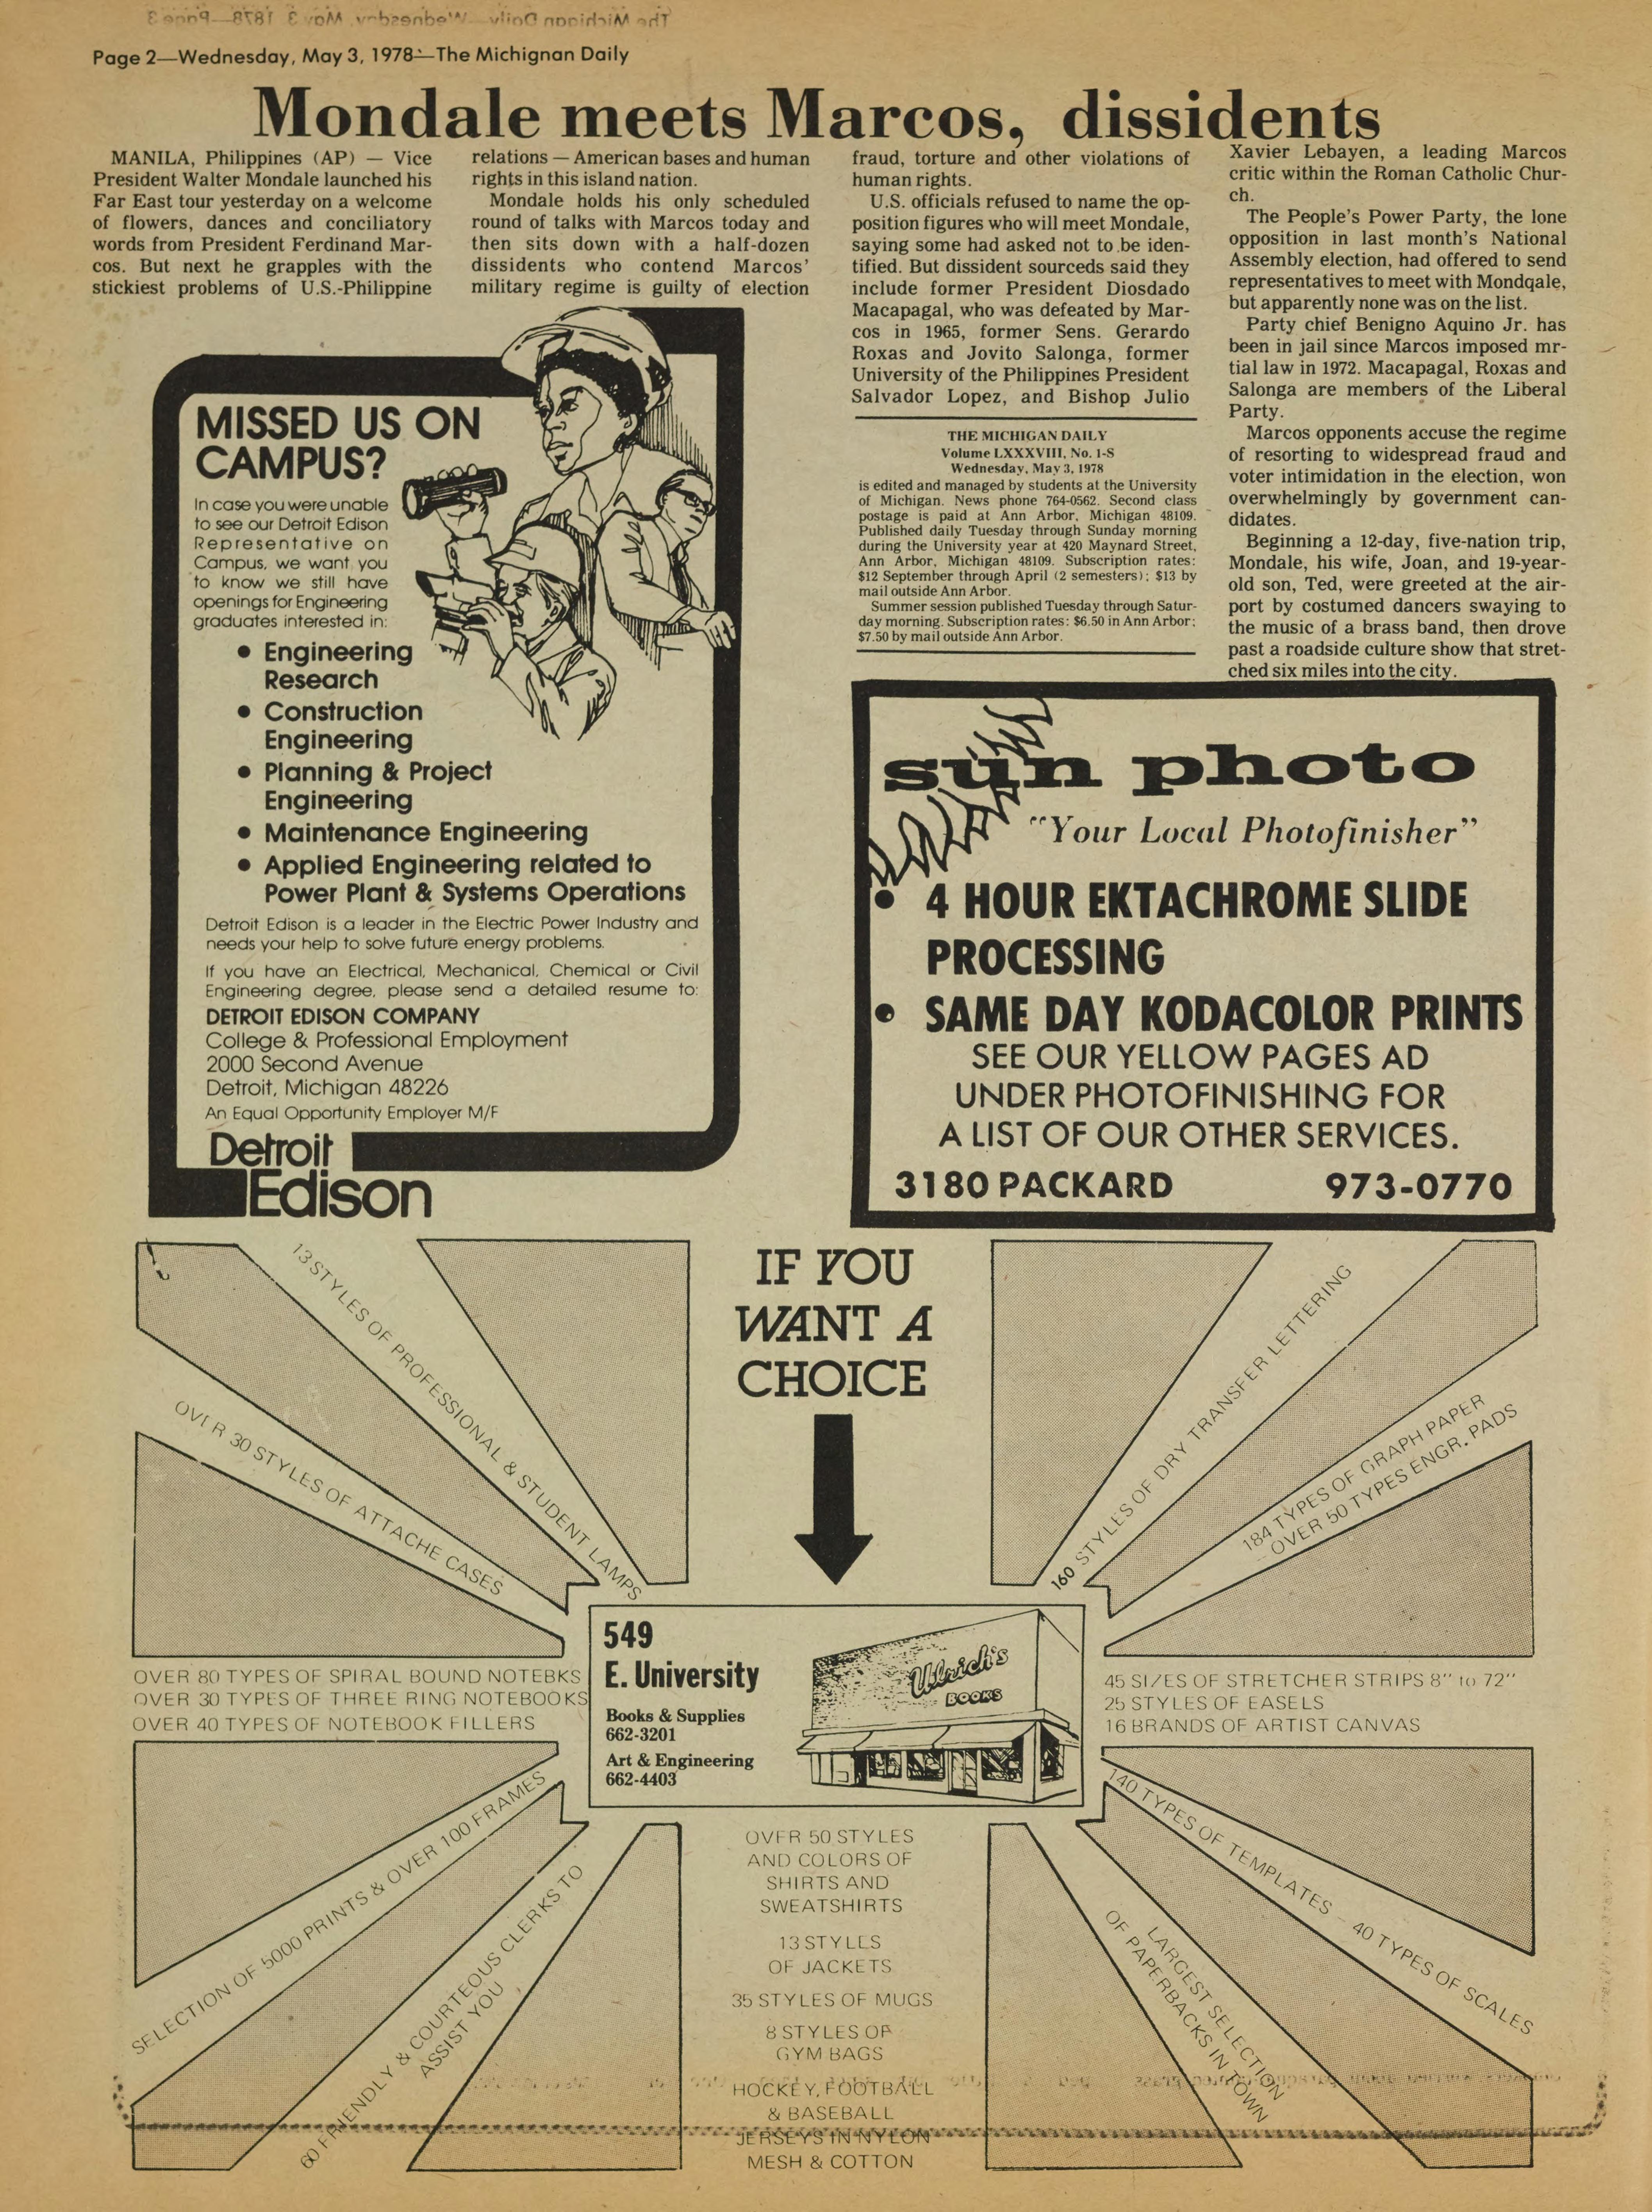 Michigan Daily Digital Archives - May 03, 1978 (vol  88, iss  1